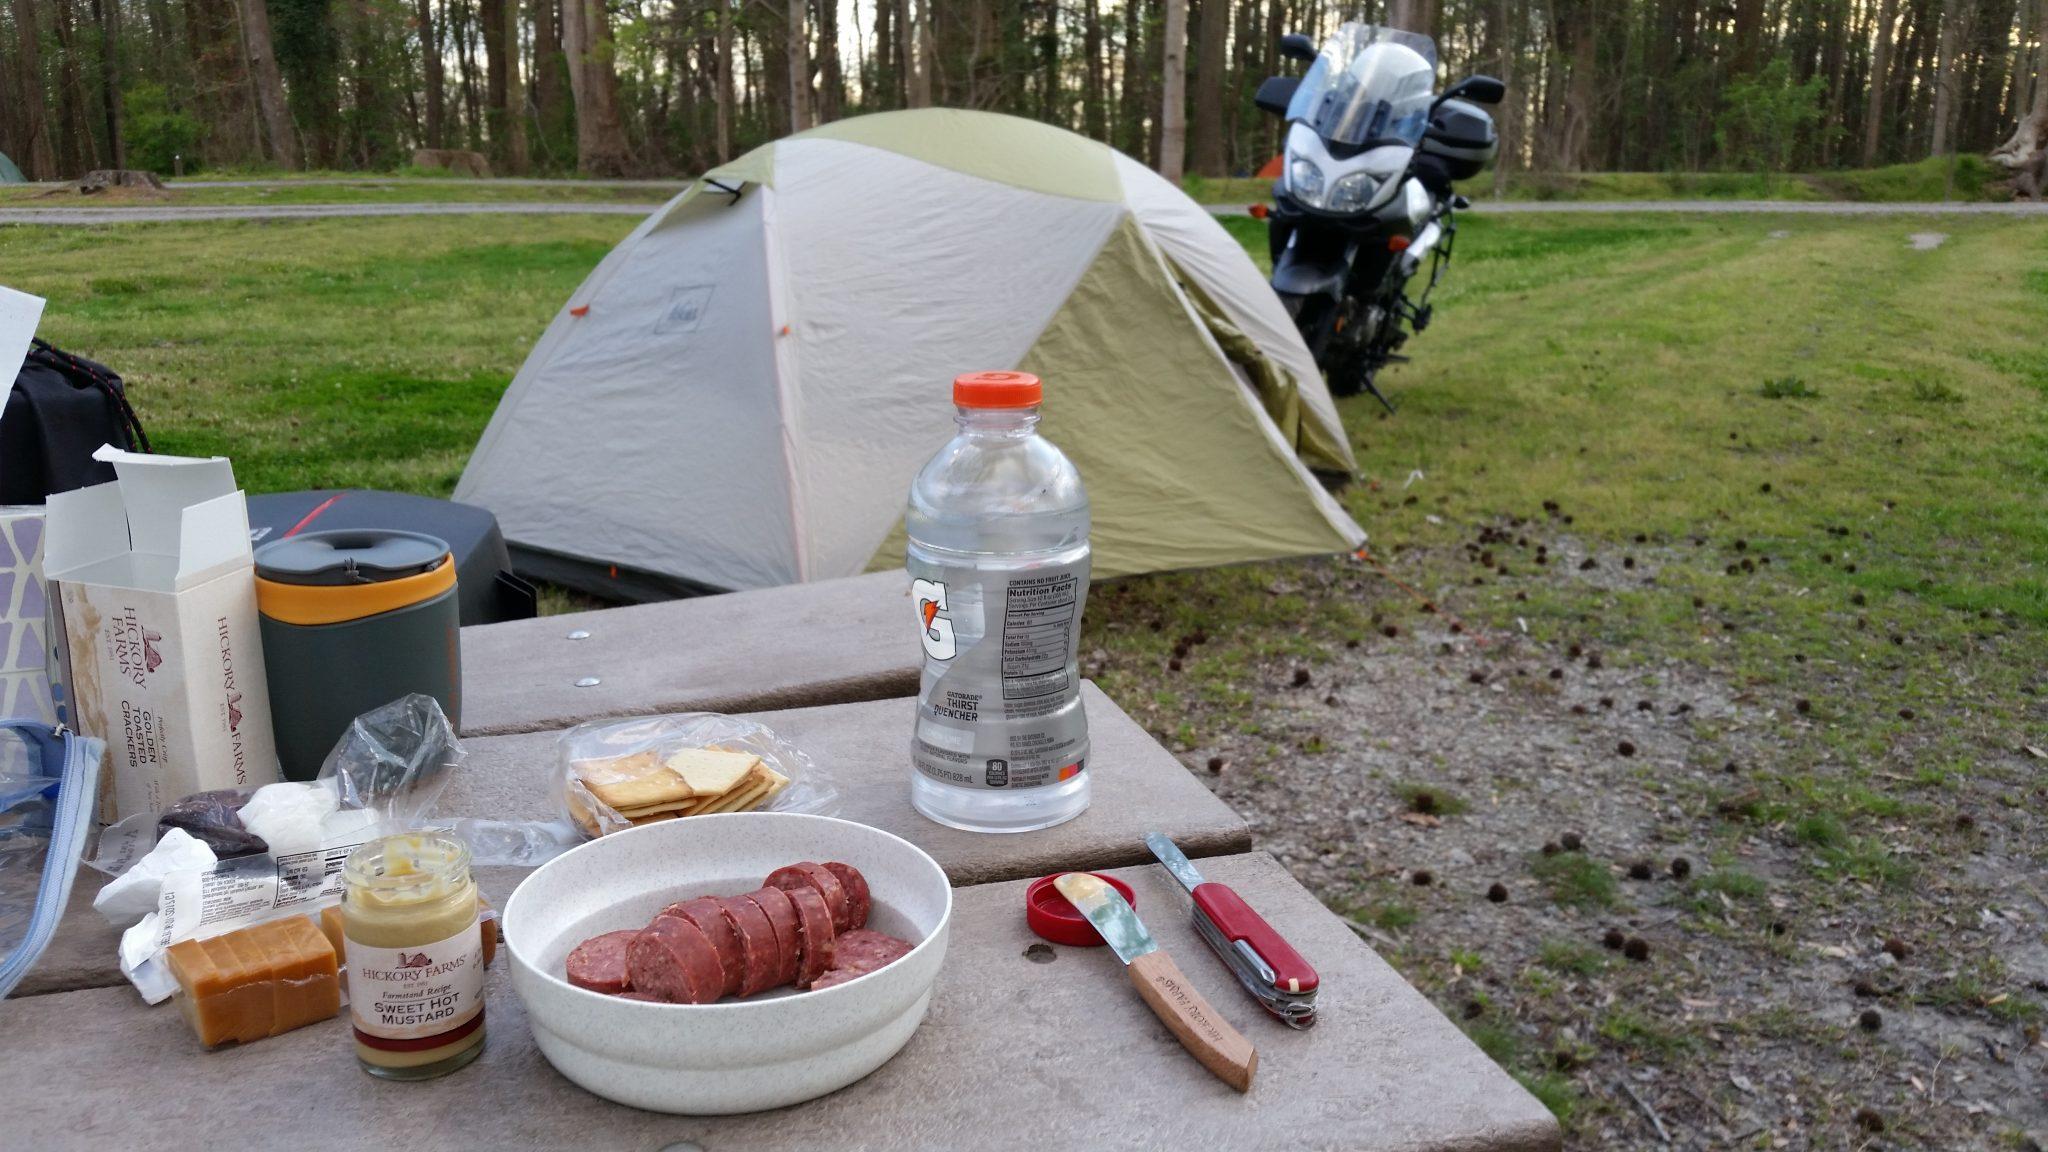 Camp dinner